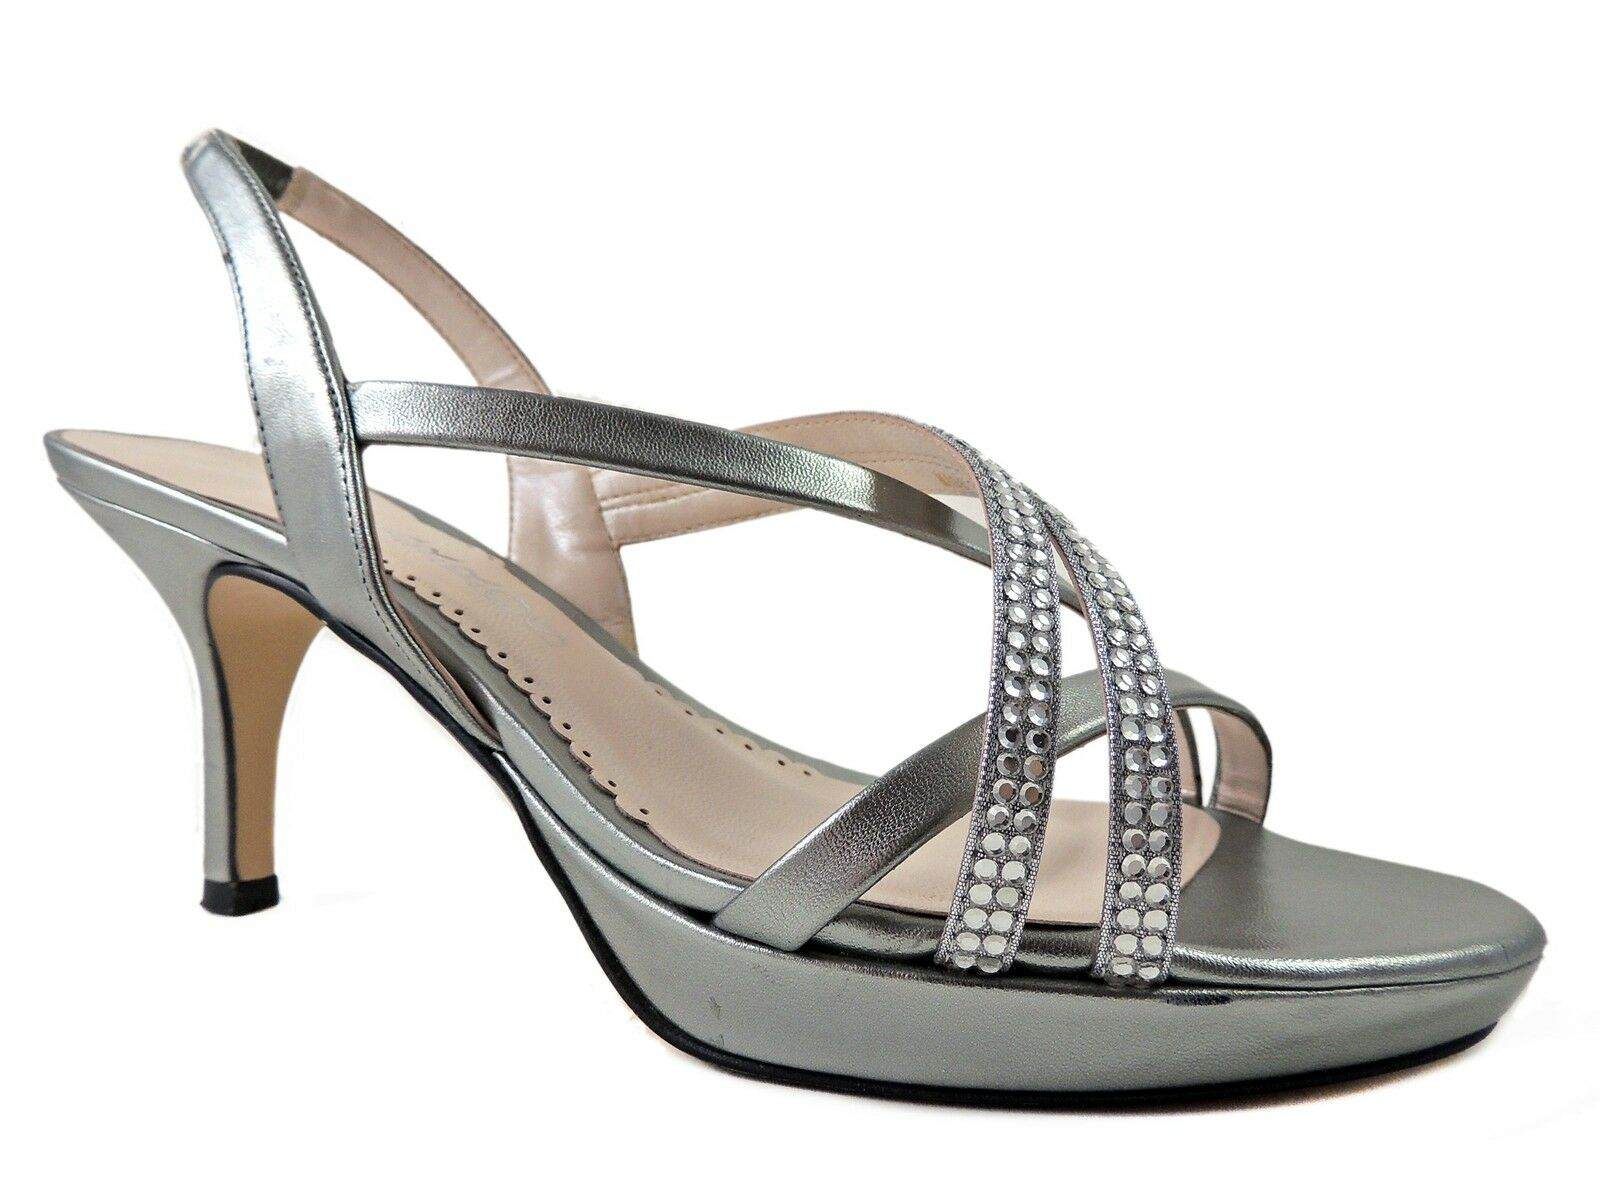 Caparros Women's Yara Platform Sandals Mercury Metallic Size 7 M